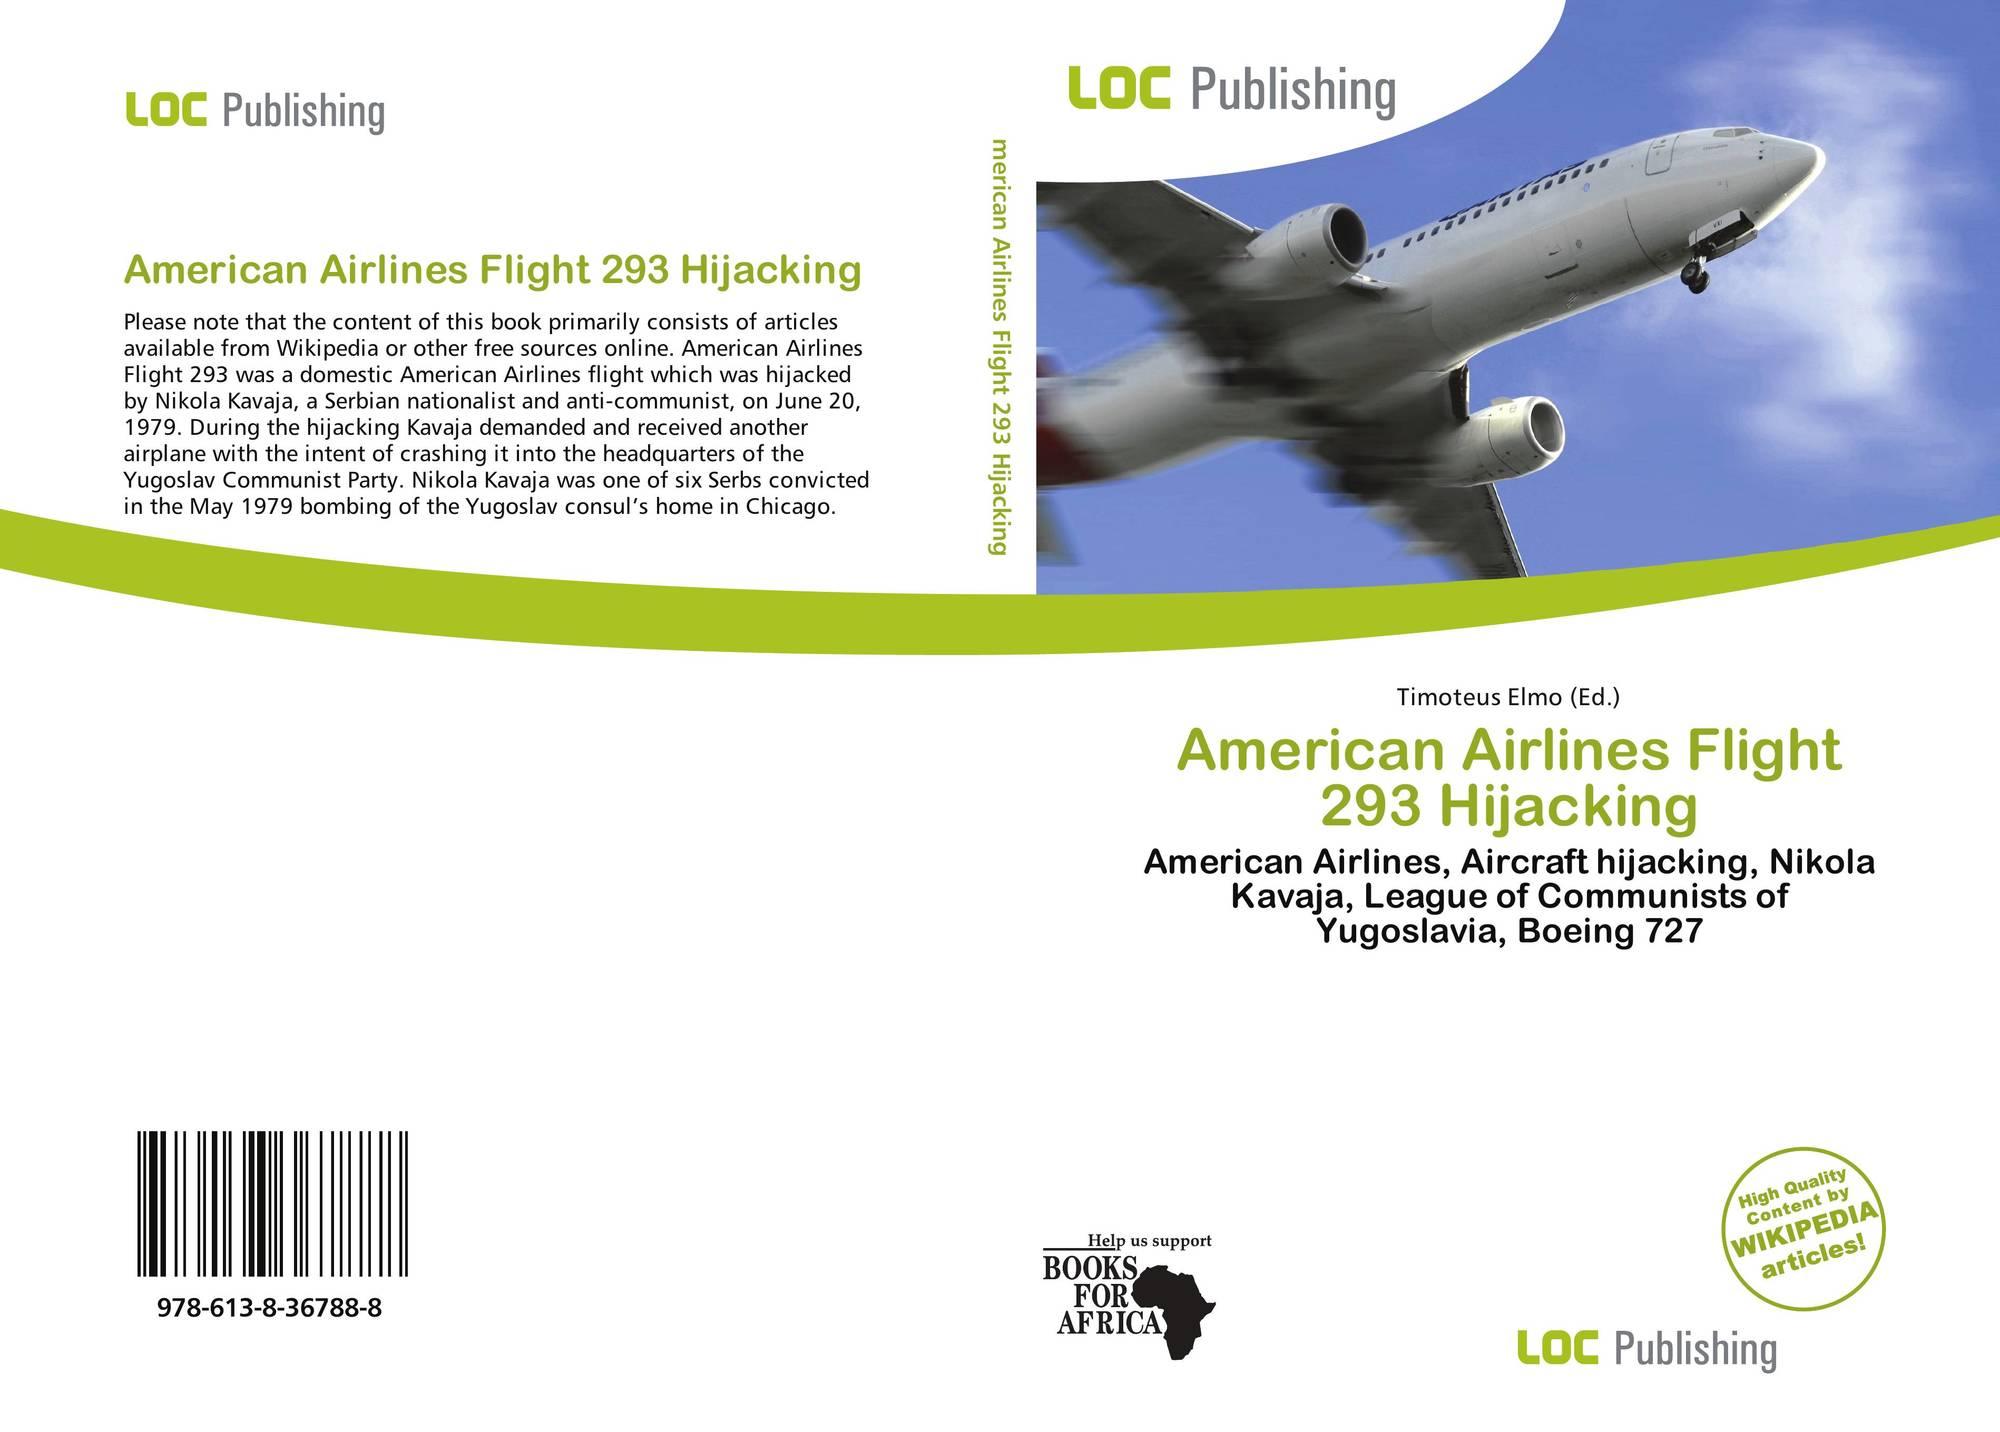 American Airlines Flight 293 Hijacking, 978-613-8-36788-8 ...